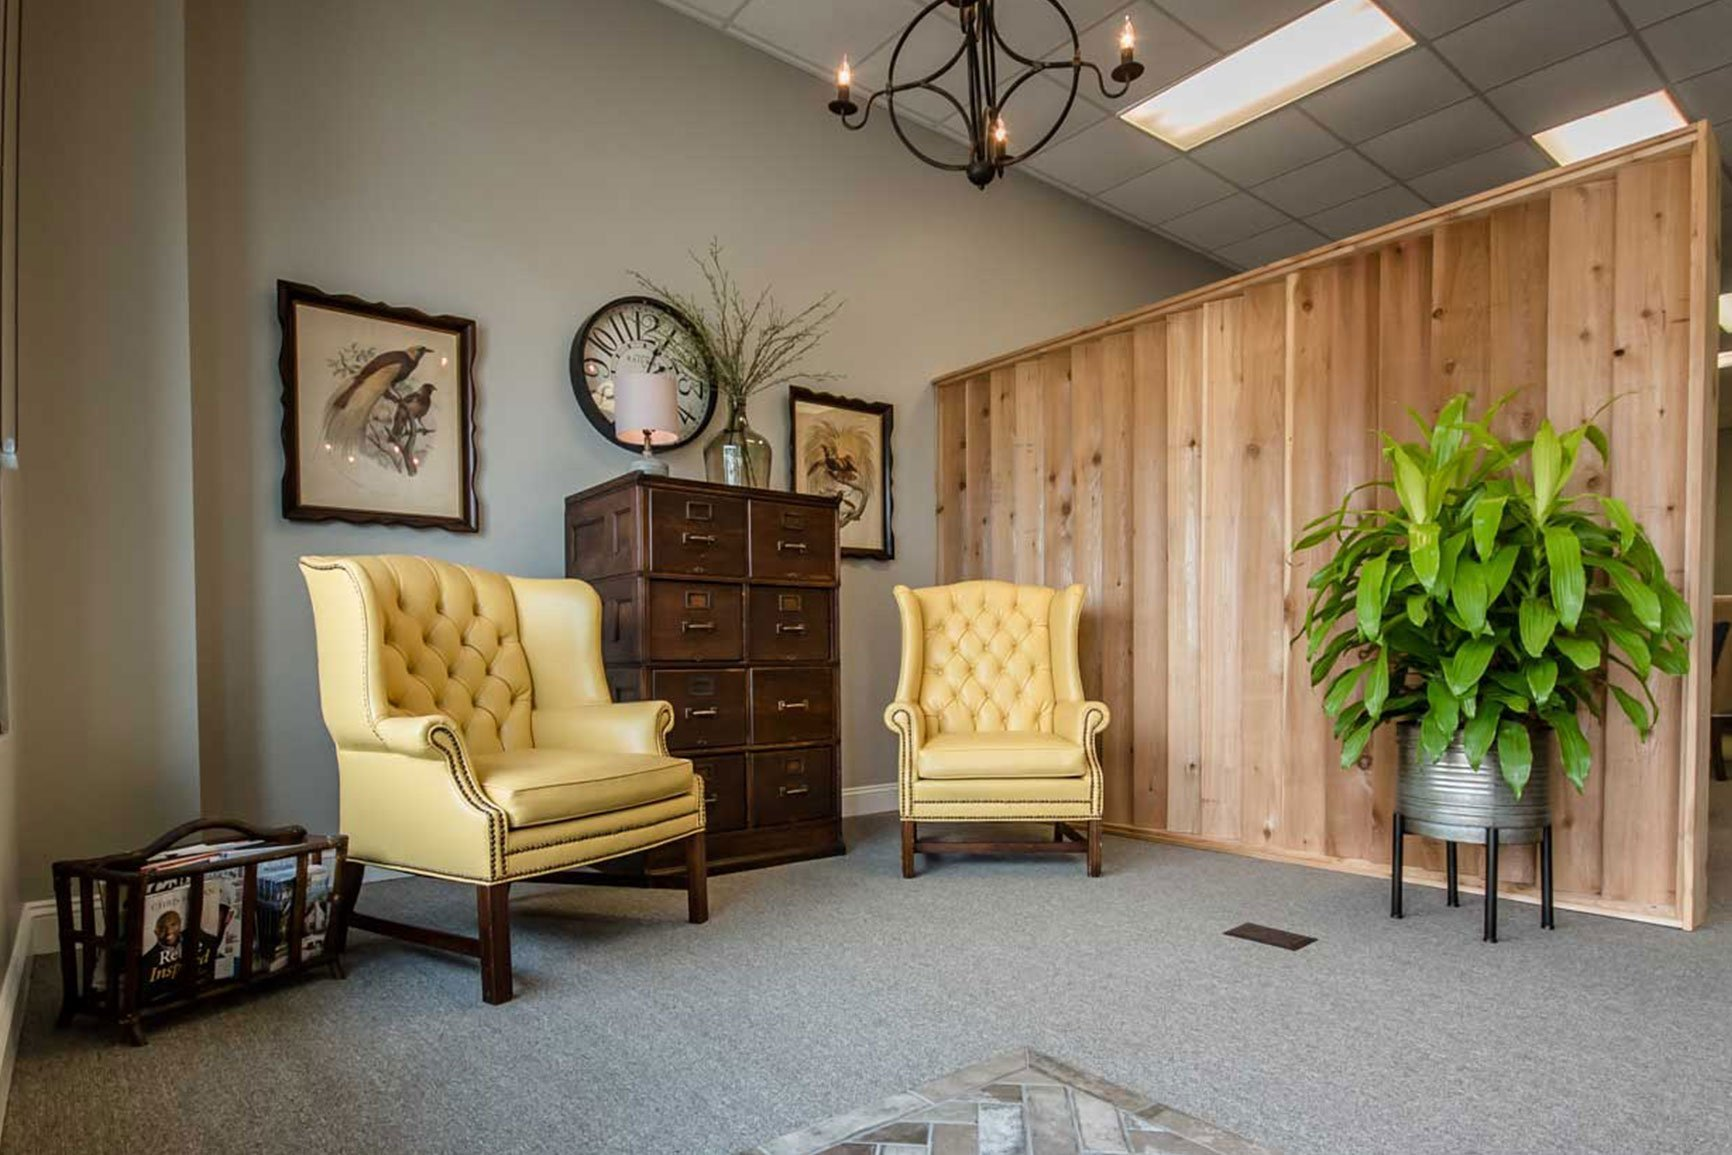 Mercer Hughes Real Estate Office In Valdosta